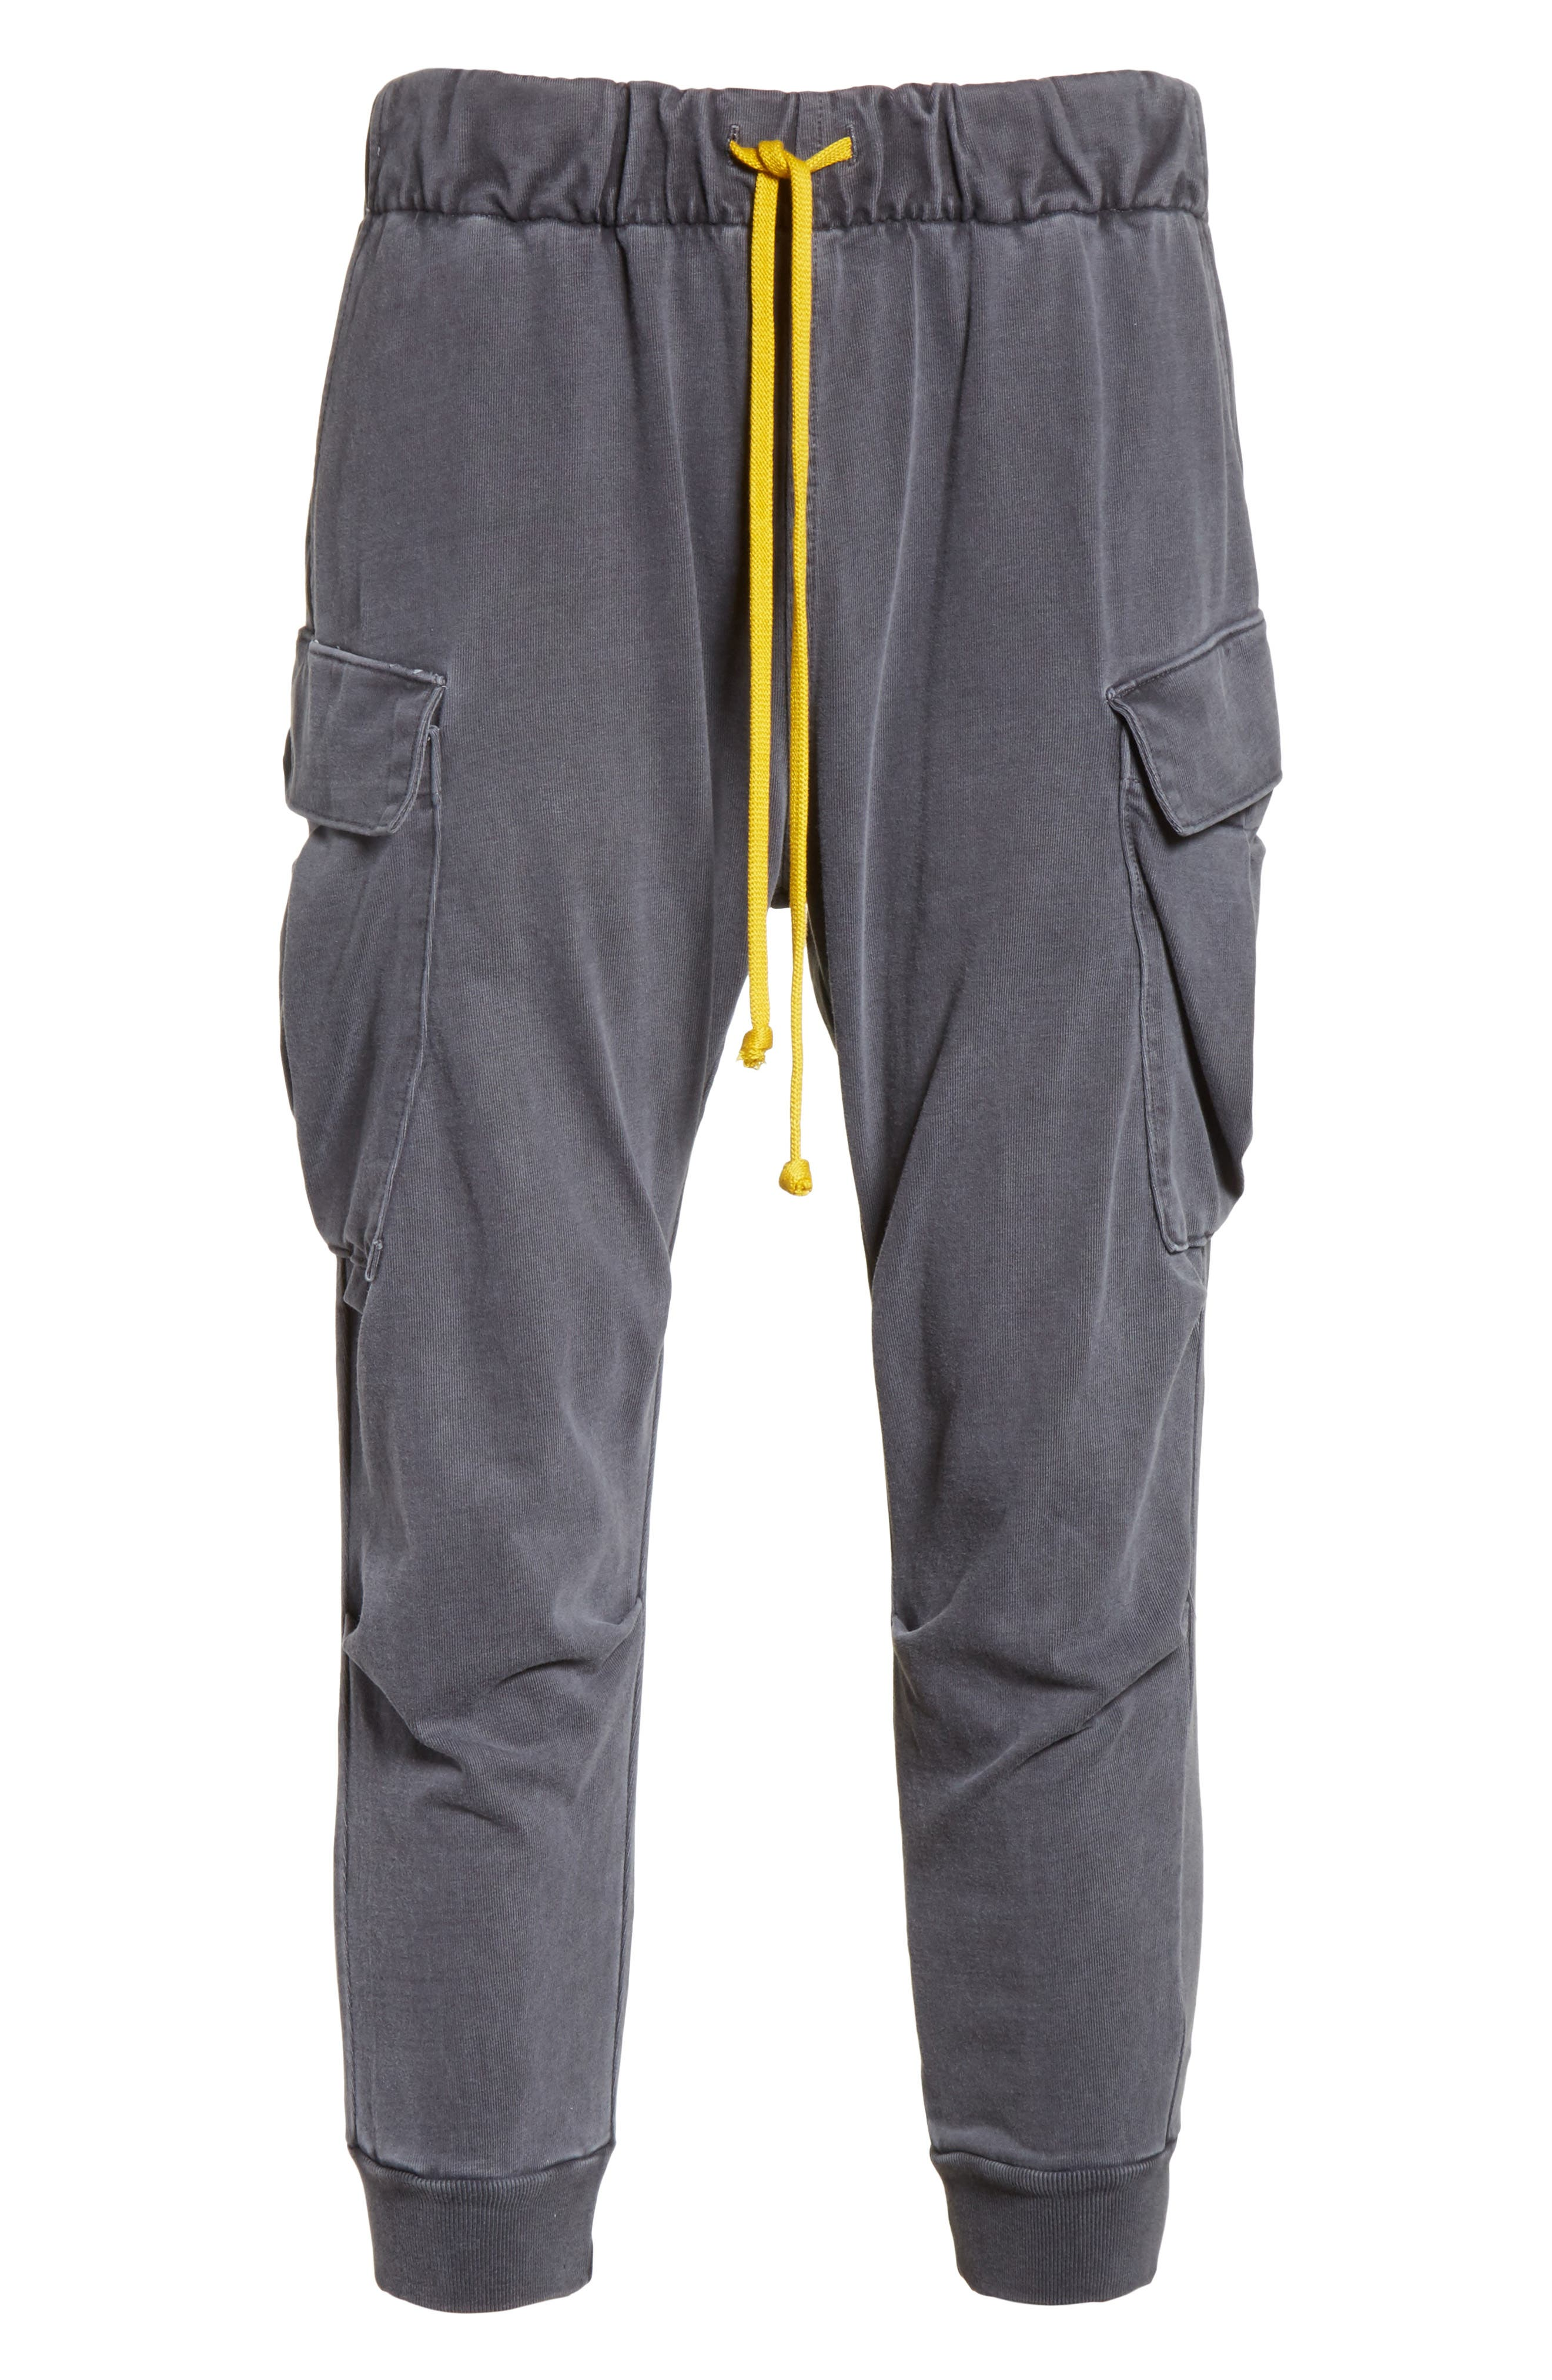 Geri Cropped Jogger Cargo Pants,                             Alternate thumbnail 6, color,                             989